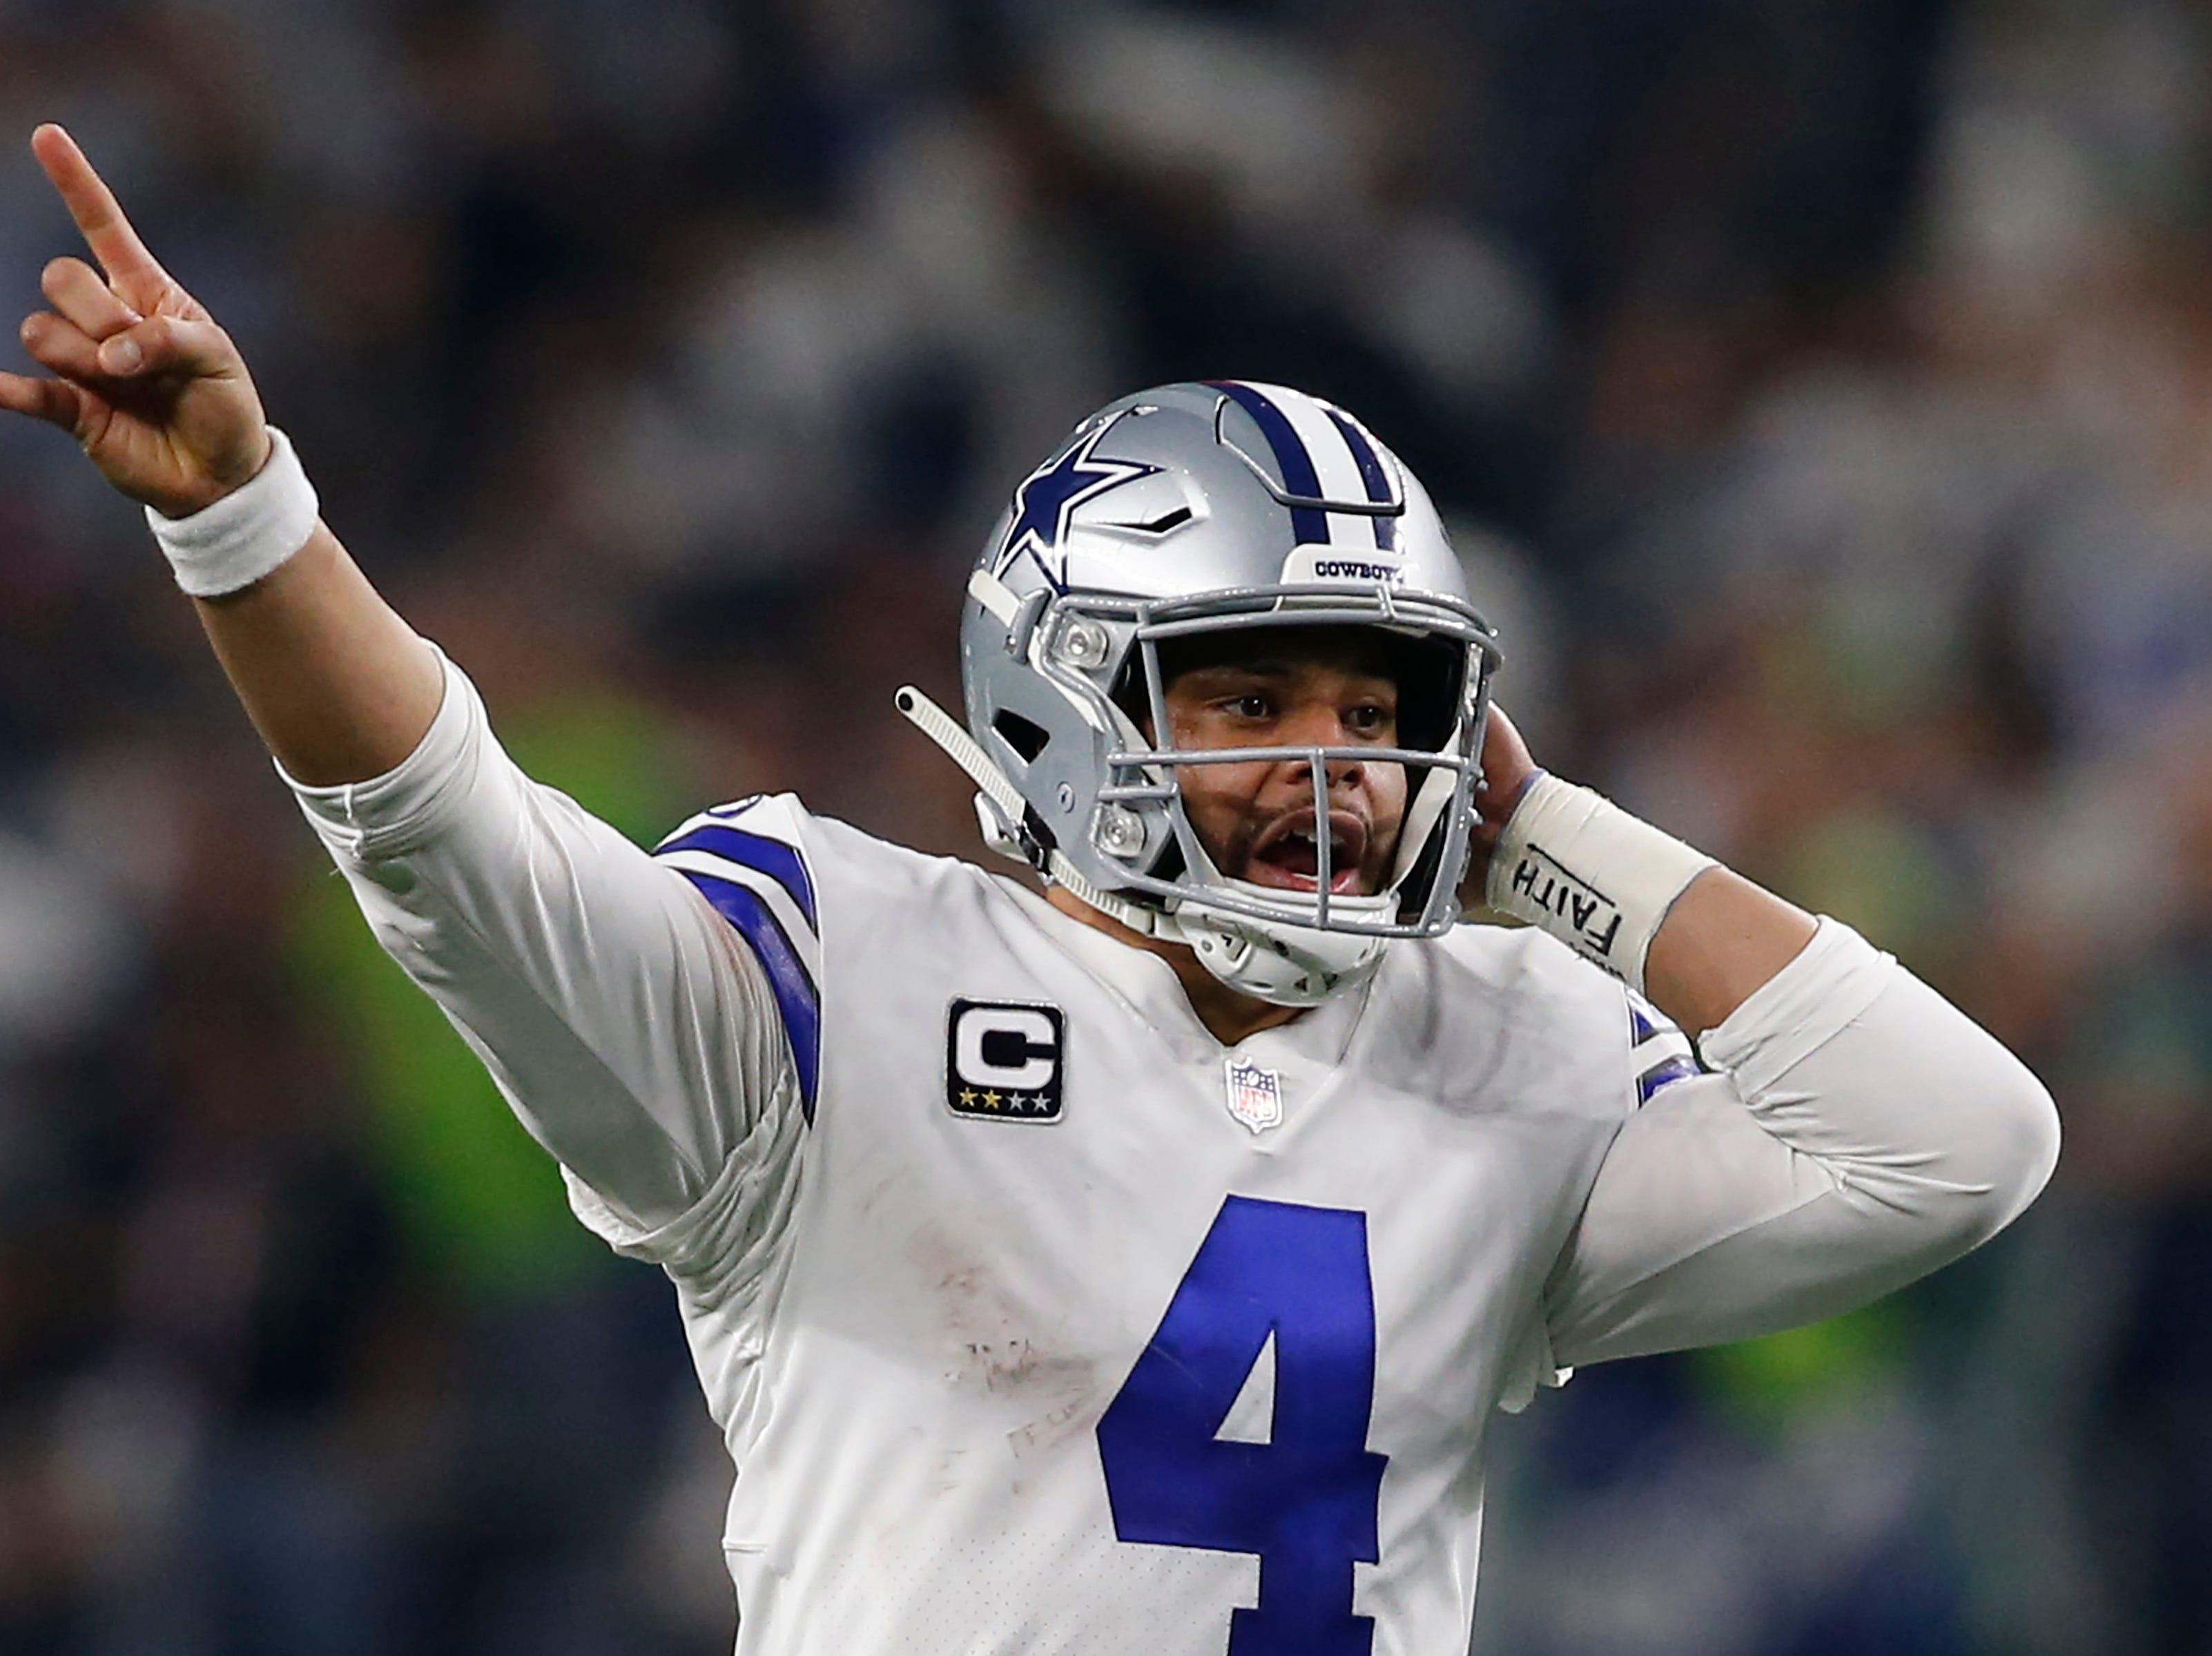 Dallas Cowboys quarterback Dak Prescott calls a play in the fourth quarter against the Seattle Seahawks at AT&T Stadium.